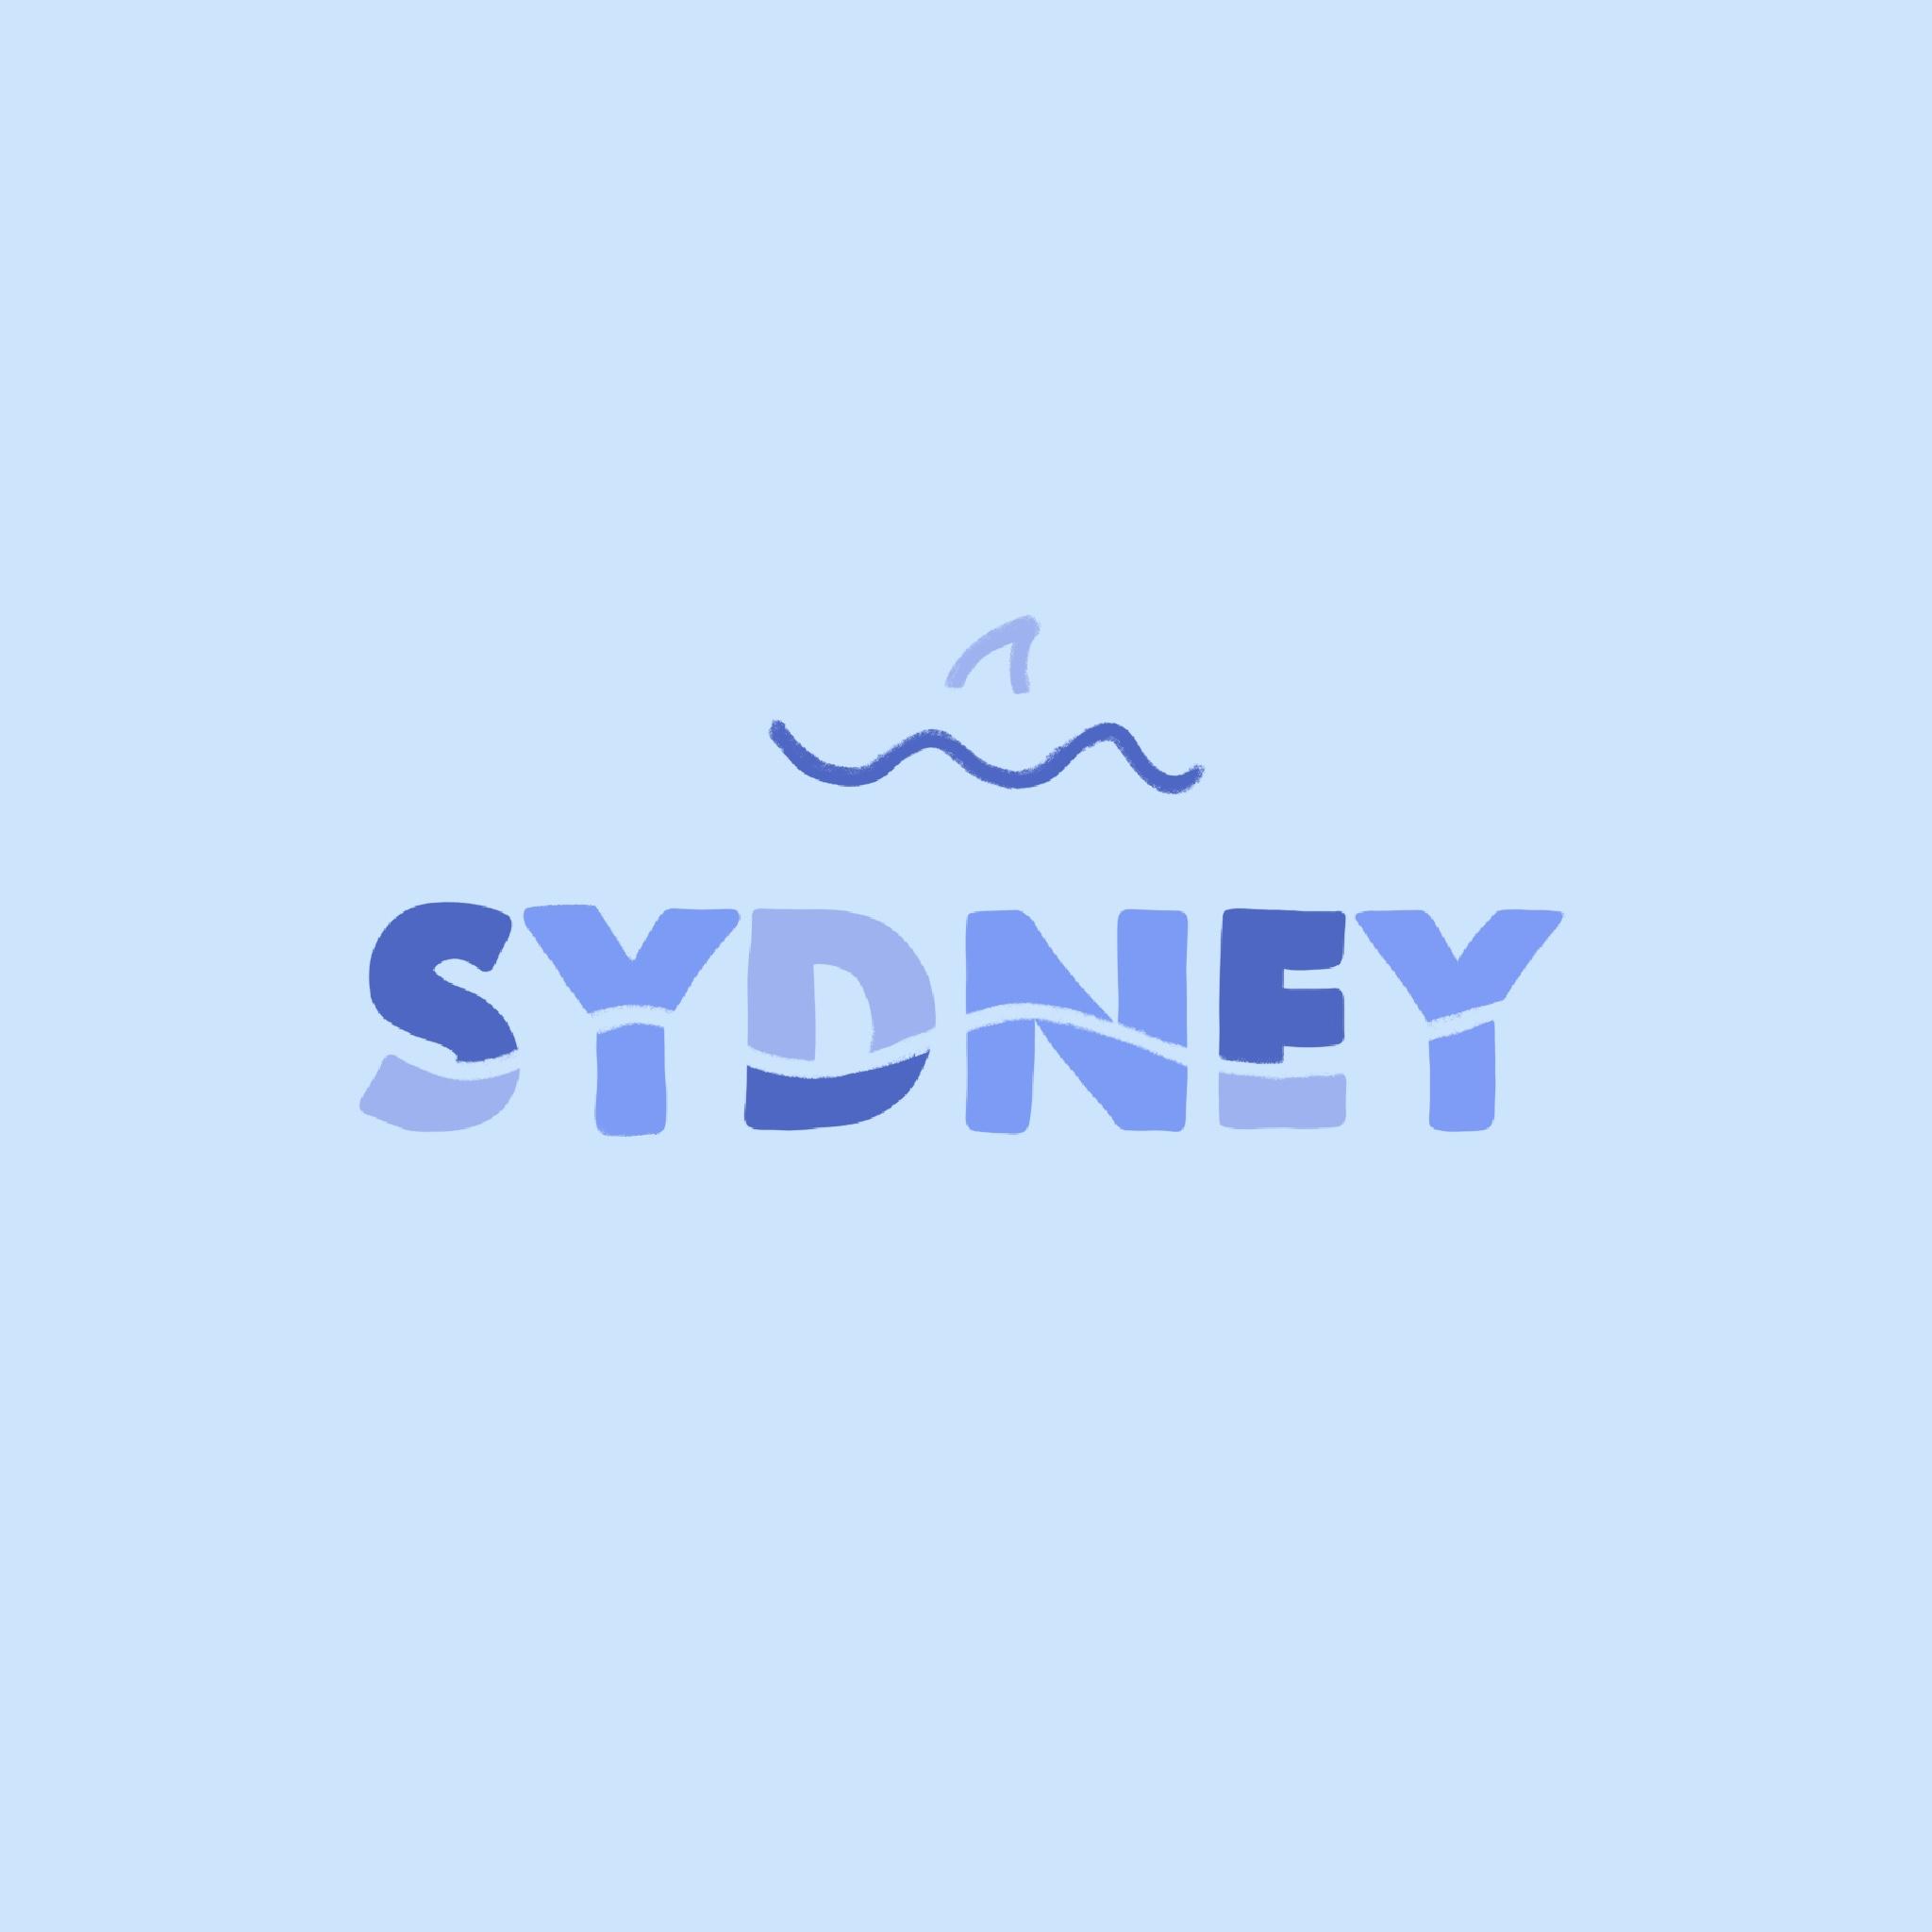 Sydney_MeganMcKean.jpg